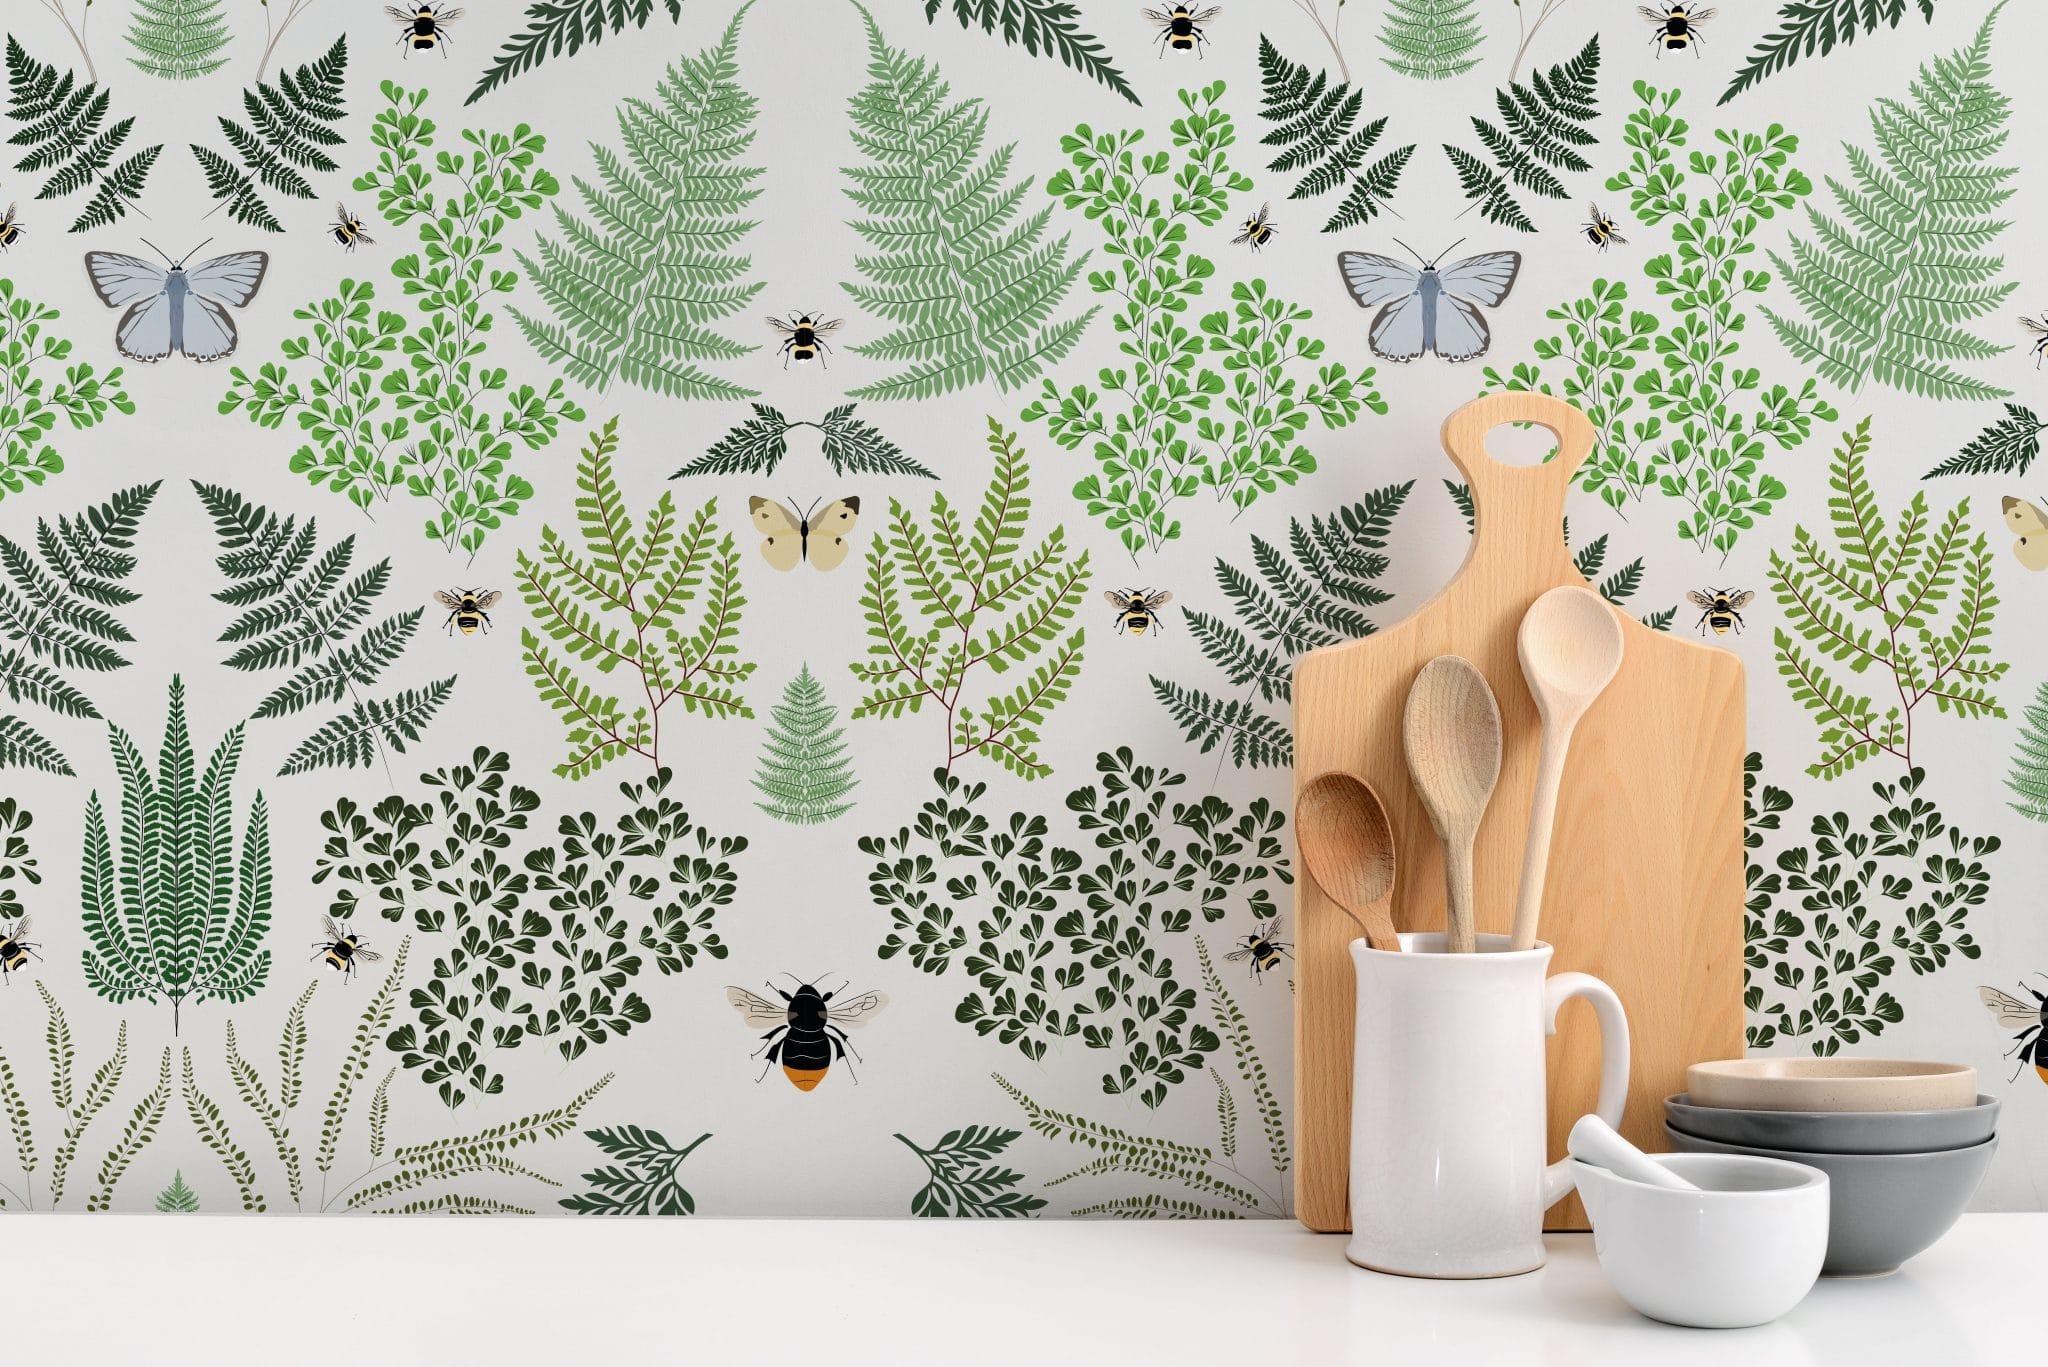 british wallpaper, ferns wallpaper, designer wallpaper, british designer wallpaper, green wallpaper, luxury wallpaper, fern design, leaf wallpaper, foliage wallpaper Lorna Syson